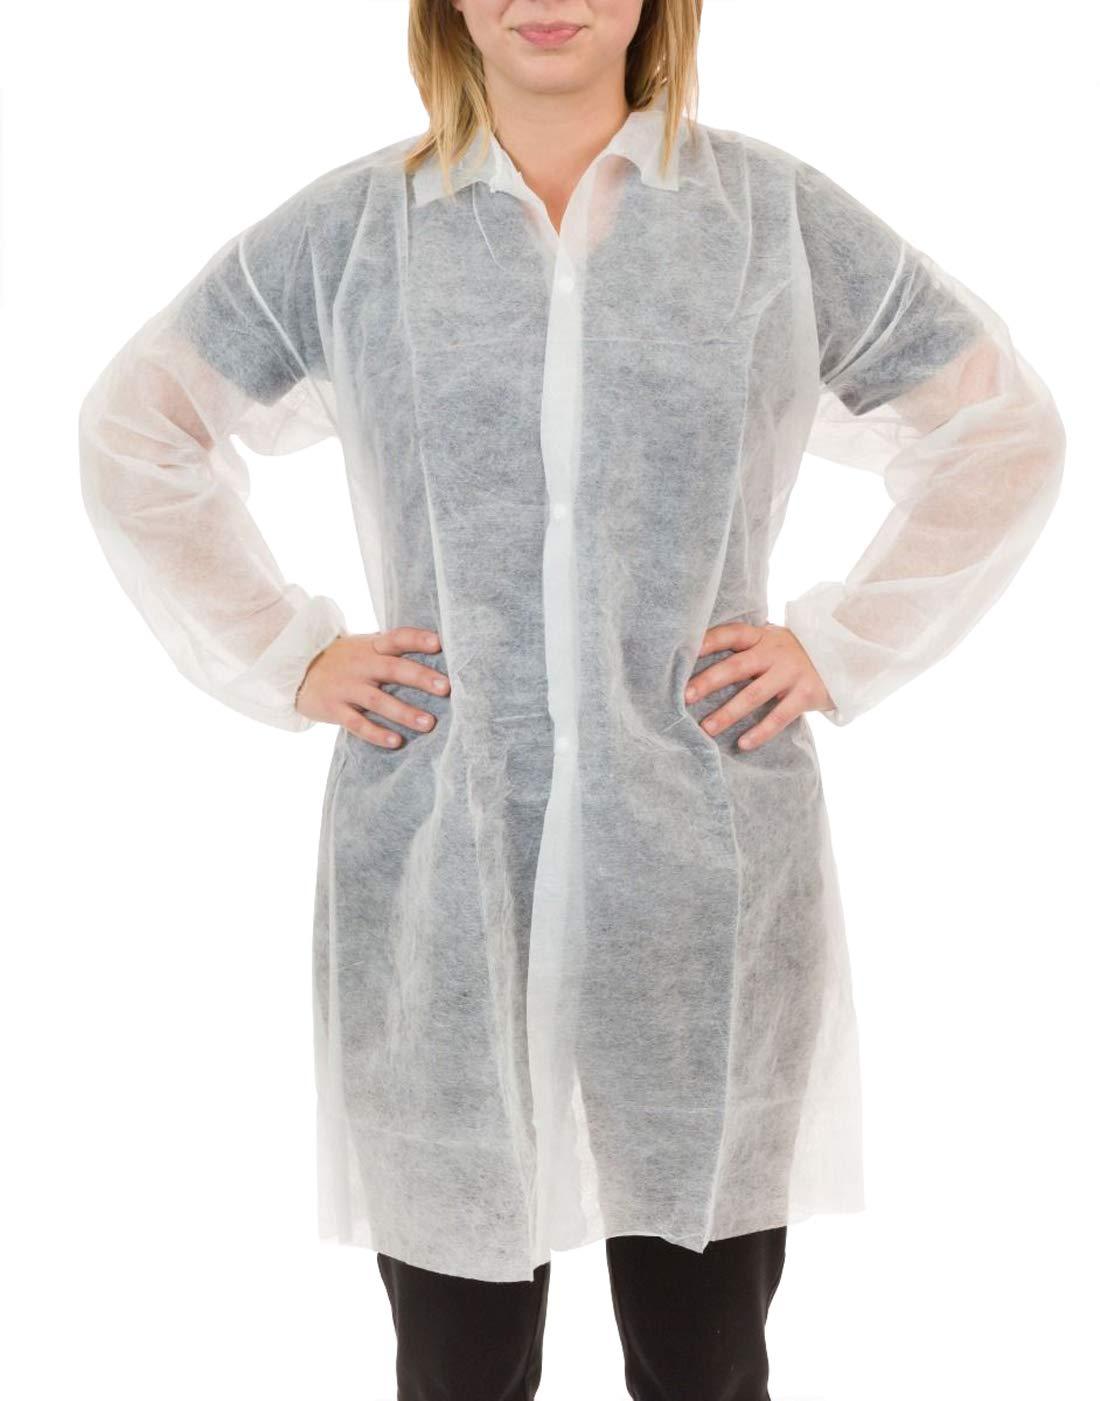 International EnviroGuard Lightweight Polypropylene Lab Coat, Front Snap Fasteners | Labs, Science, Medical, Biology, Dental (White, S, Case of 50)